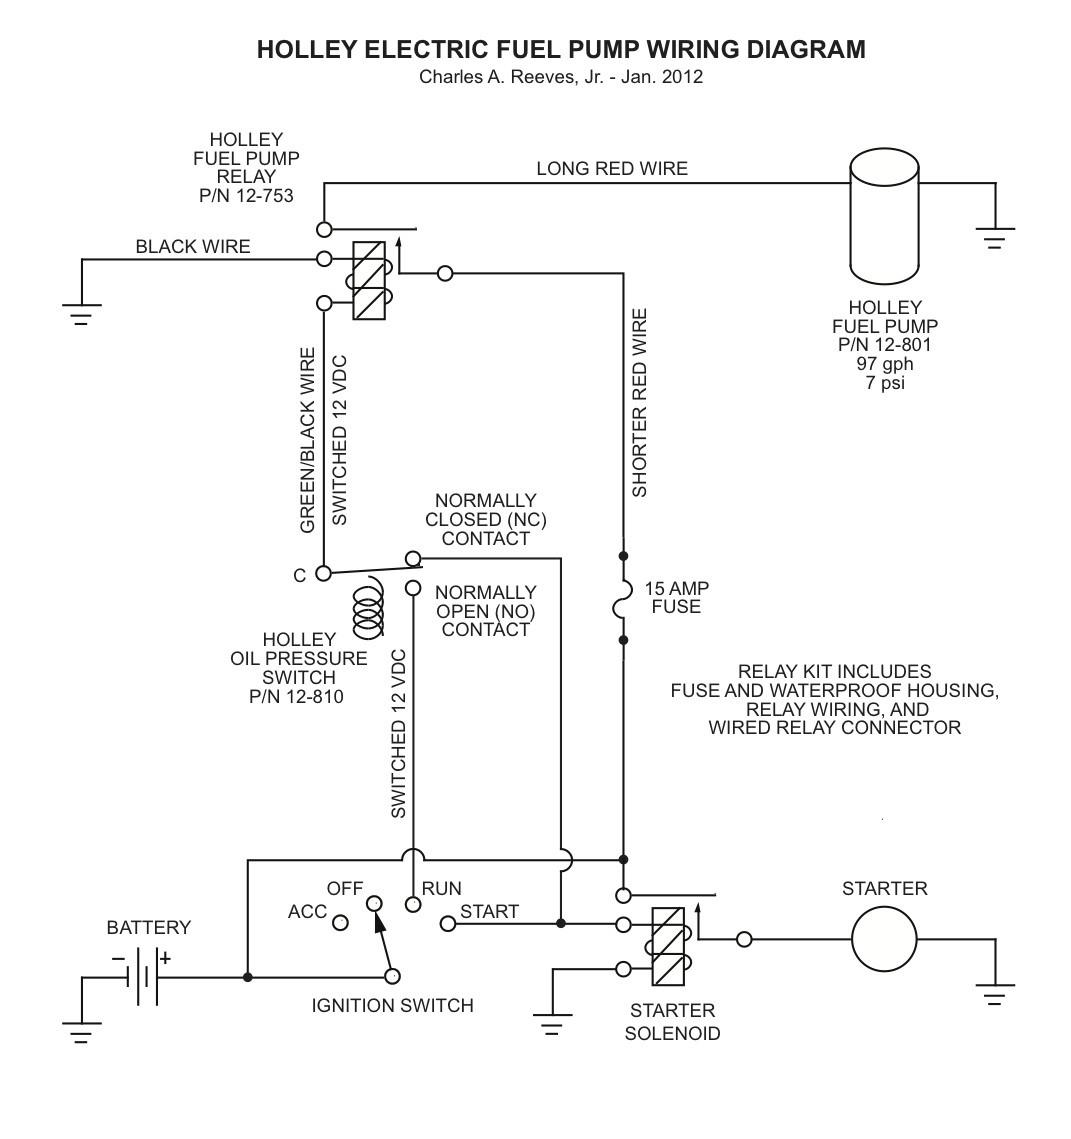 electric fuel pump relay wiring diagram Collection-Delphi Fuel Pump Wiring Diagram 9-j